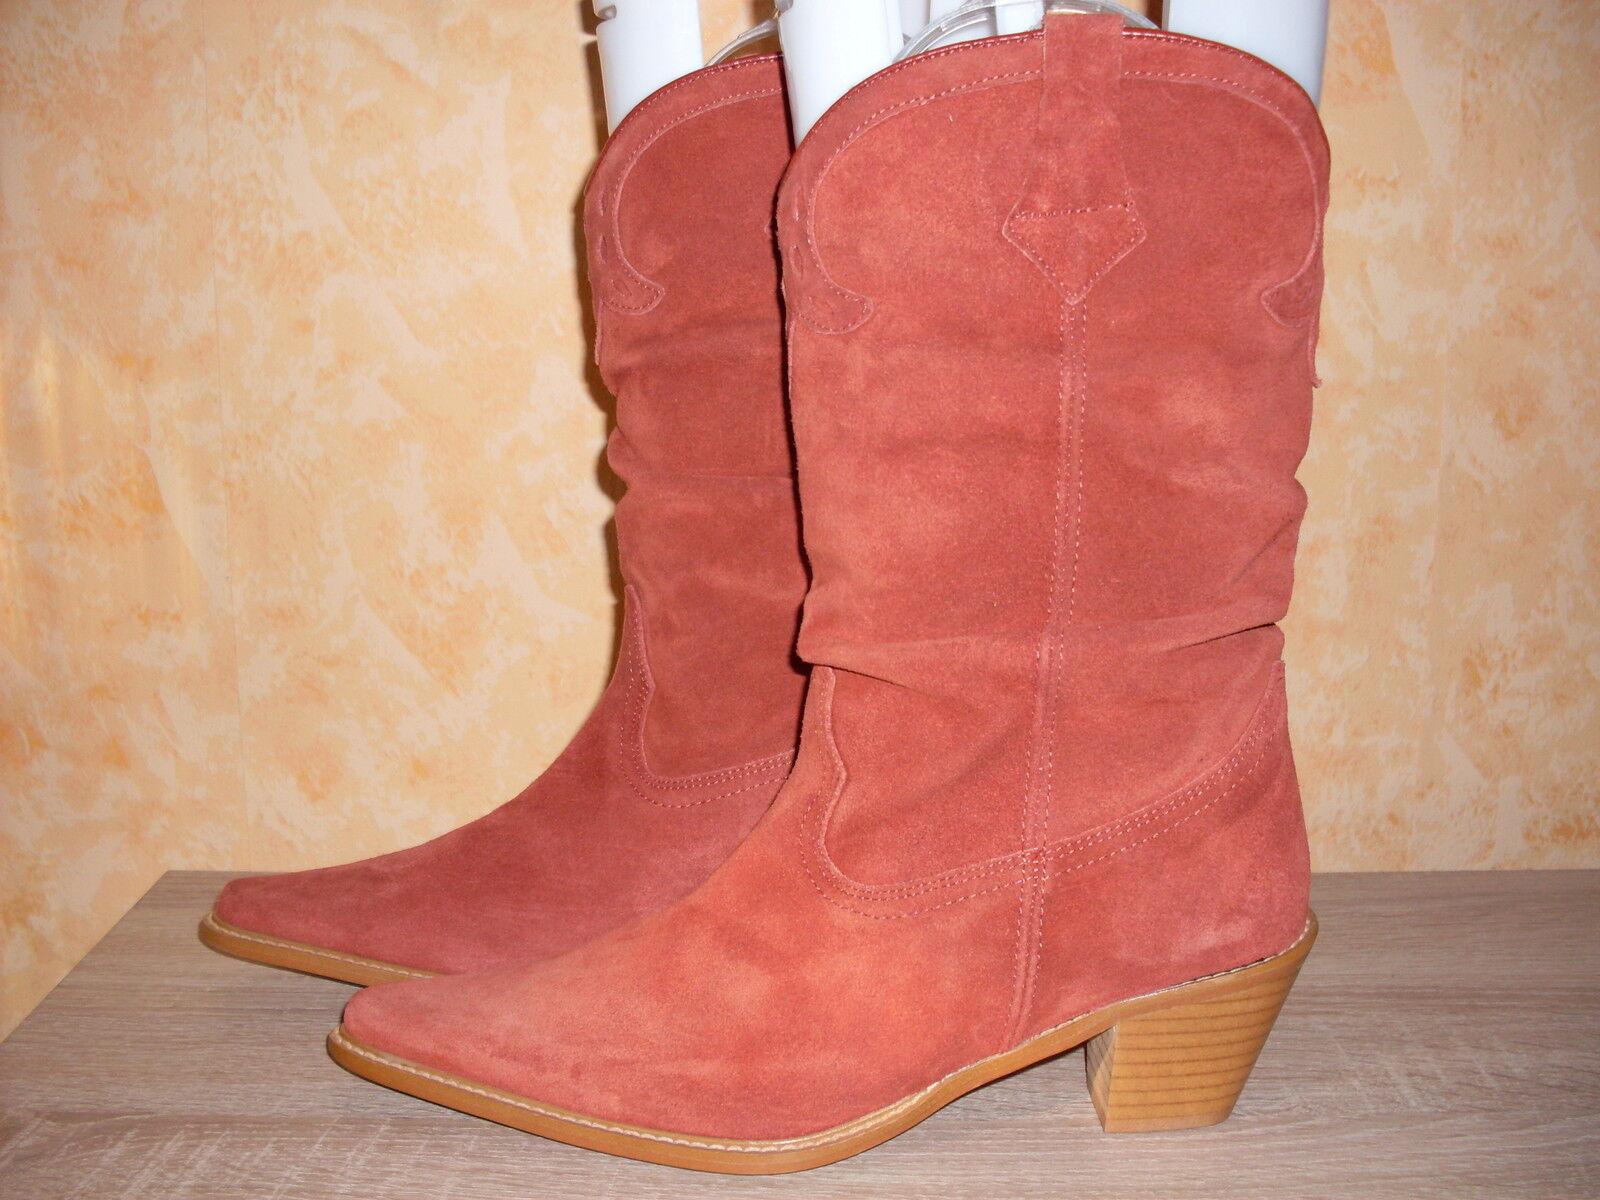 Western Boots Stiefel Cowboy Stiefel NEU Gr. Gr. Gr. 40,5 - 41 in rostred & Veloursleder 10efb6